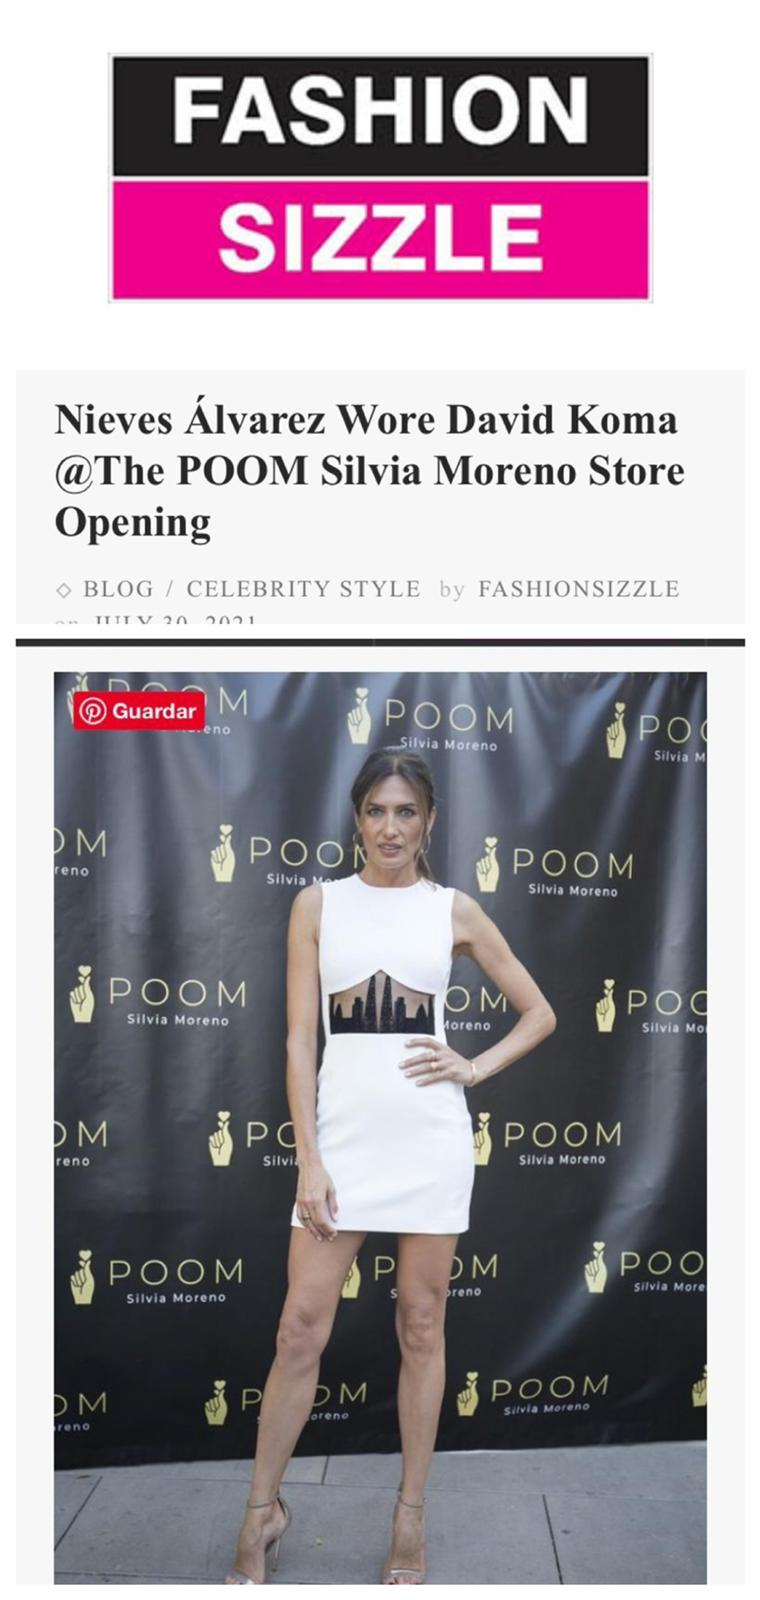 Silvia Moreno Poom en Fashion Sizzle